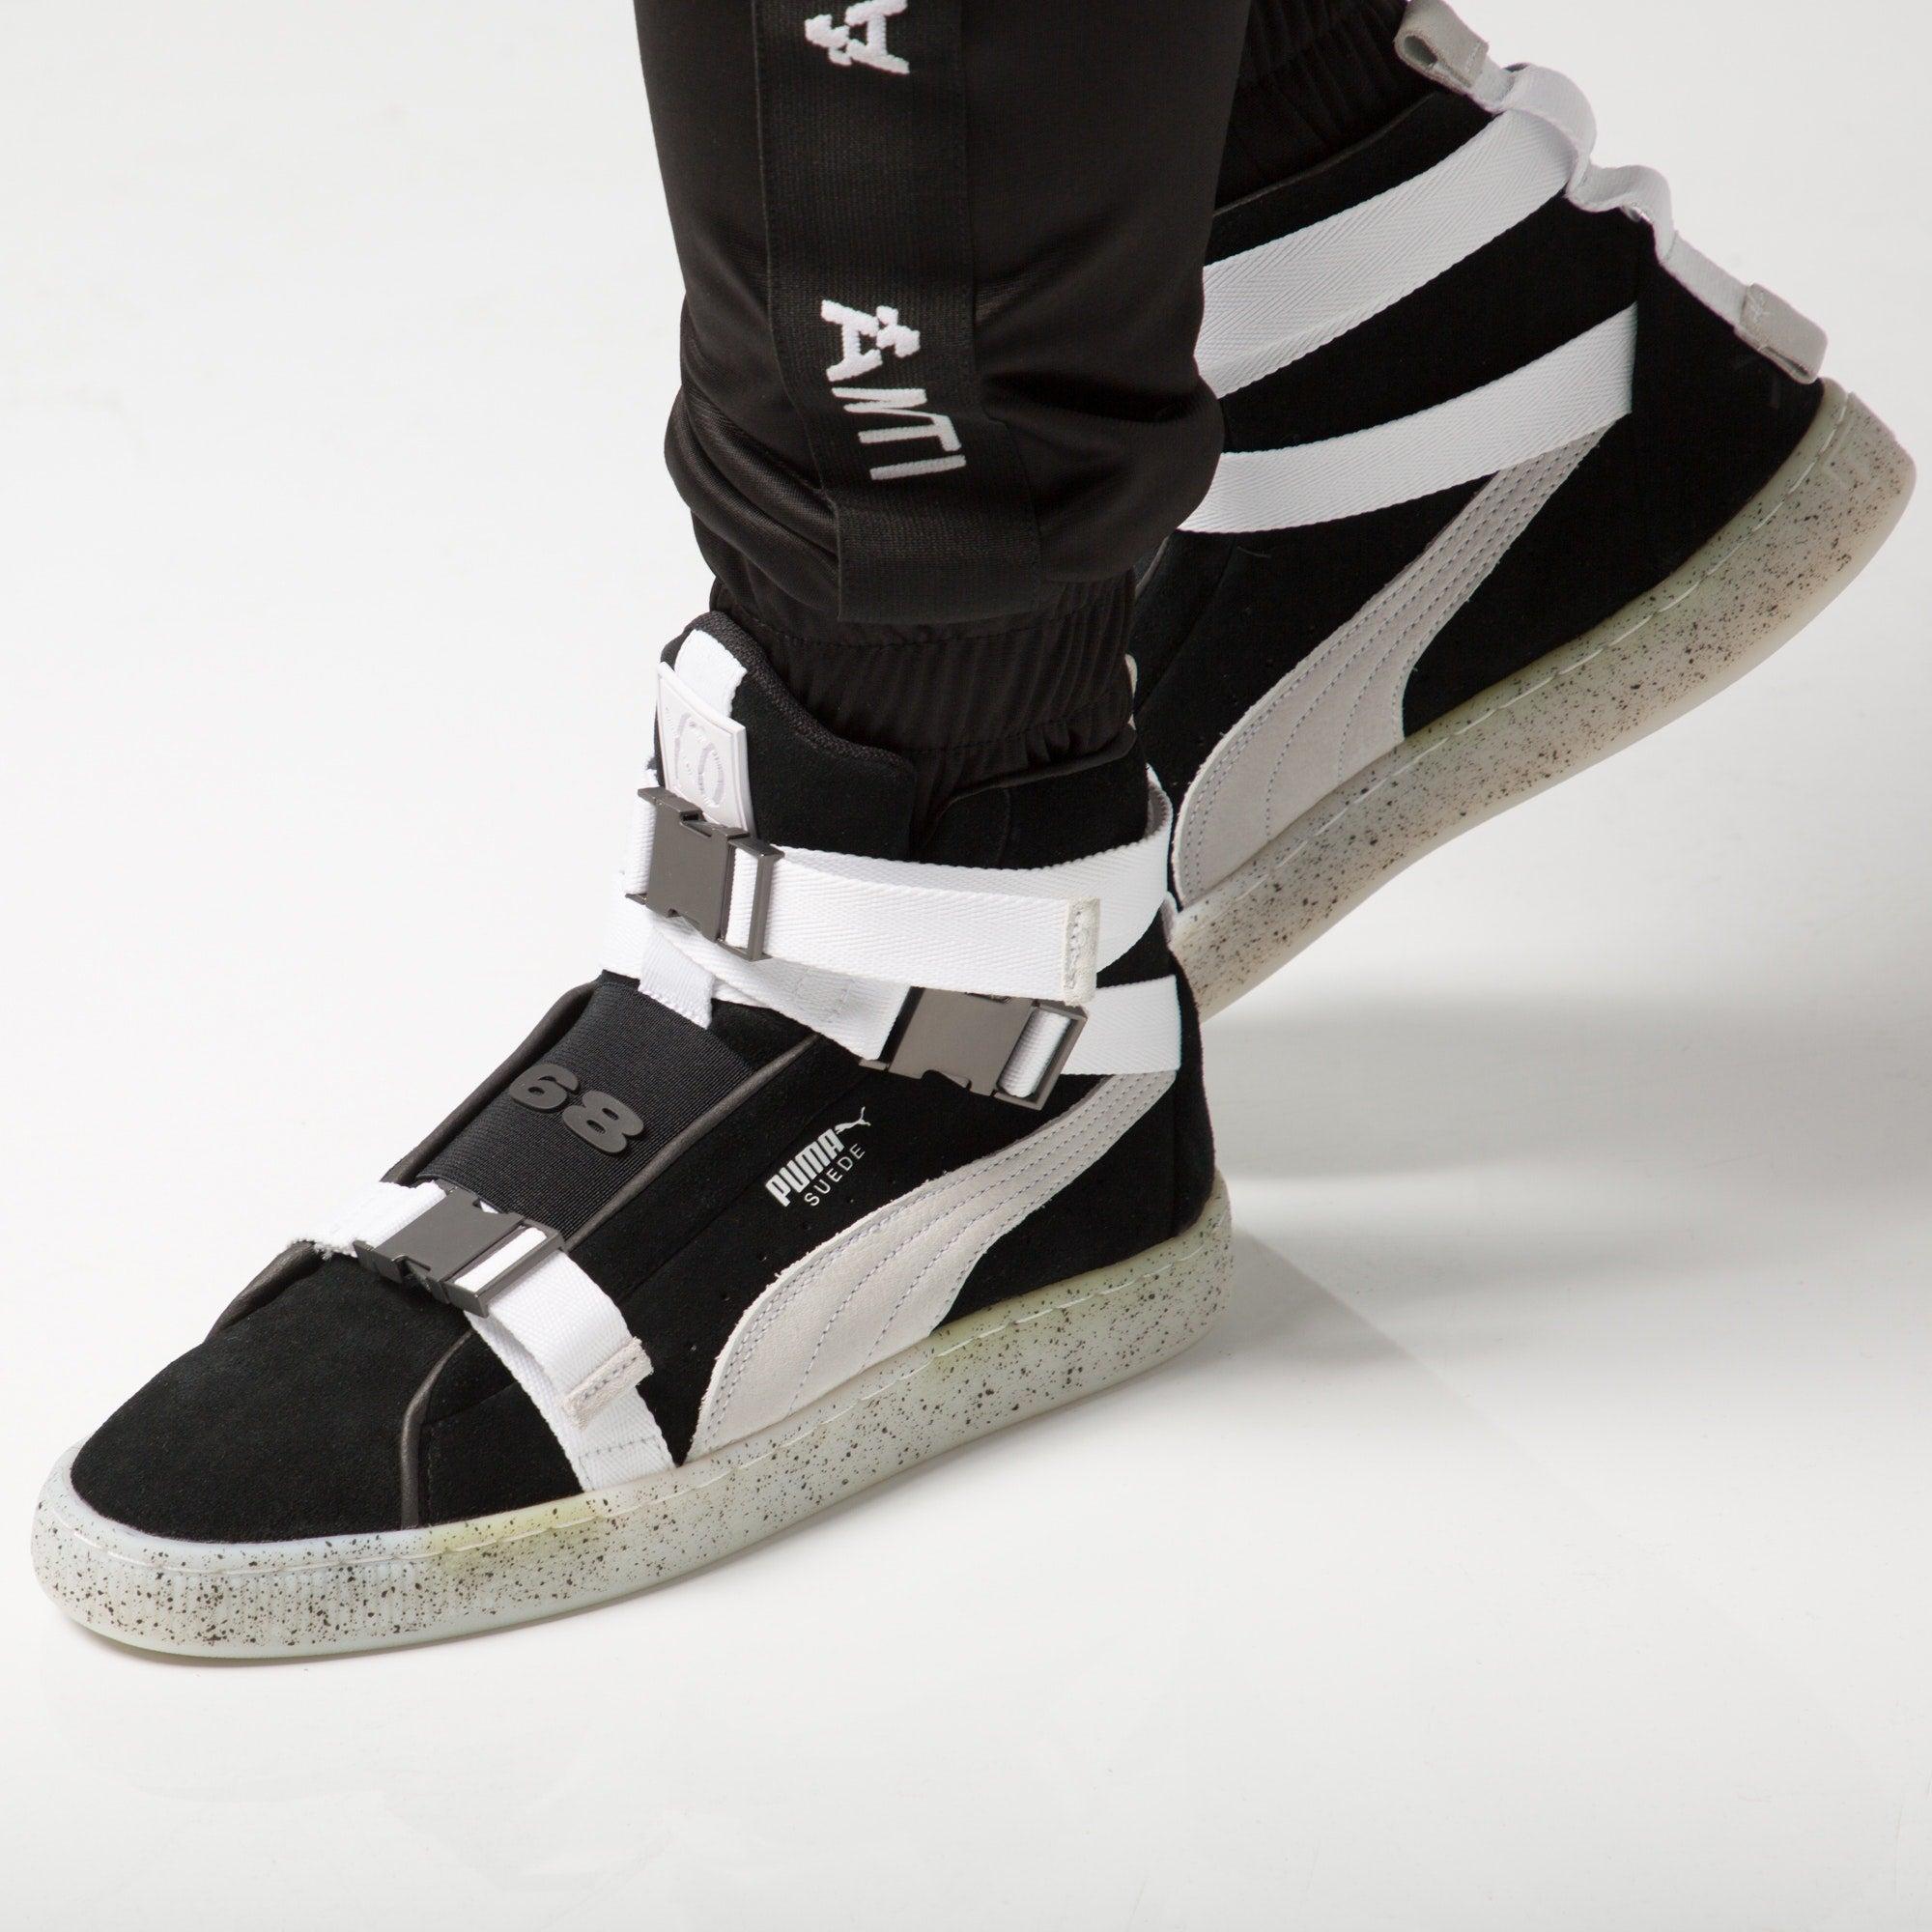 Puma Suede X The Weeknd Black/White